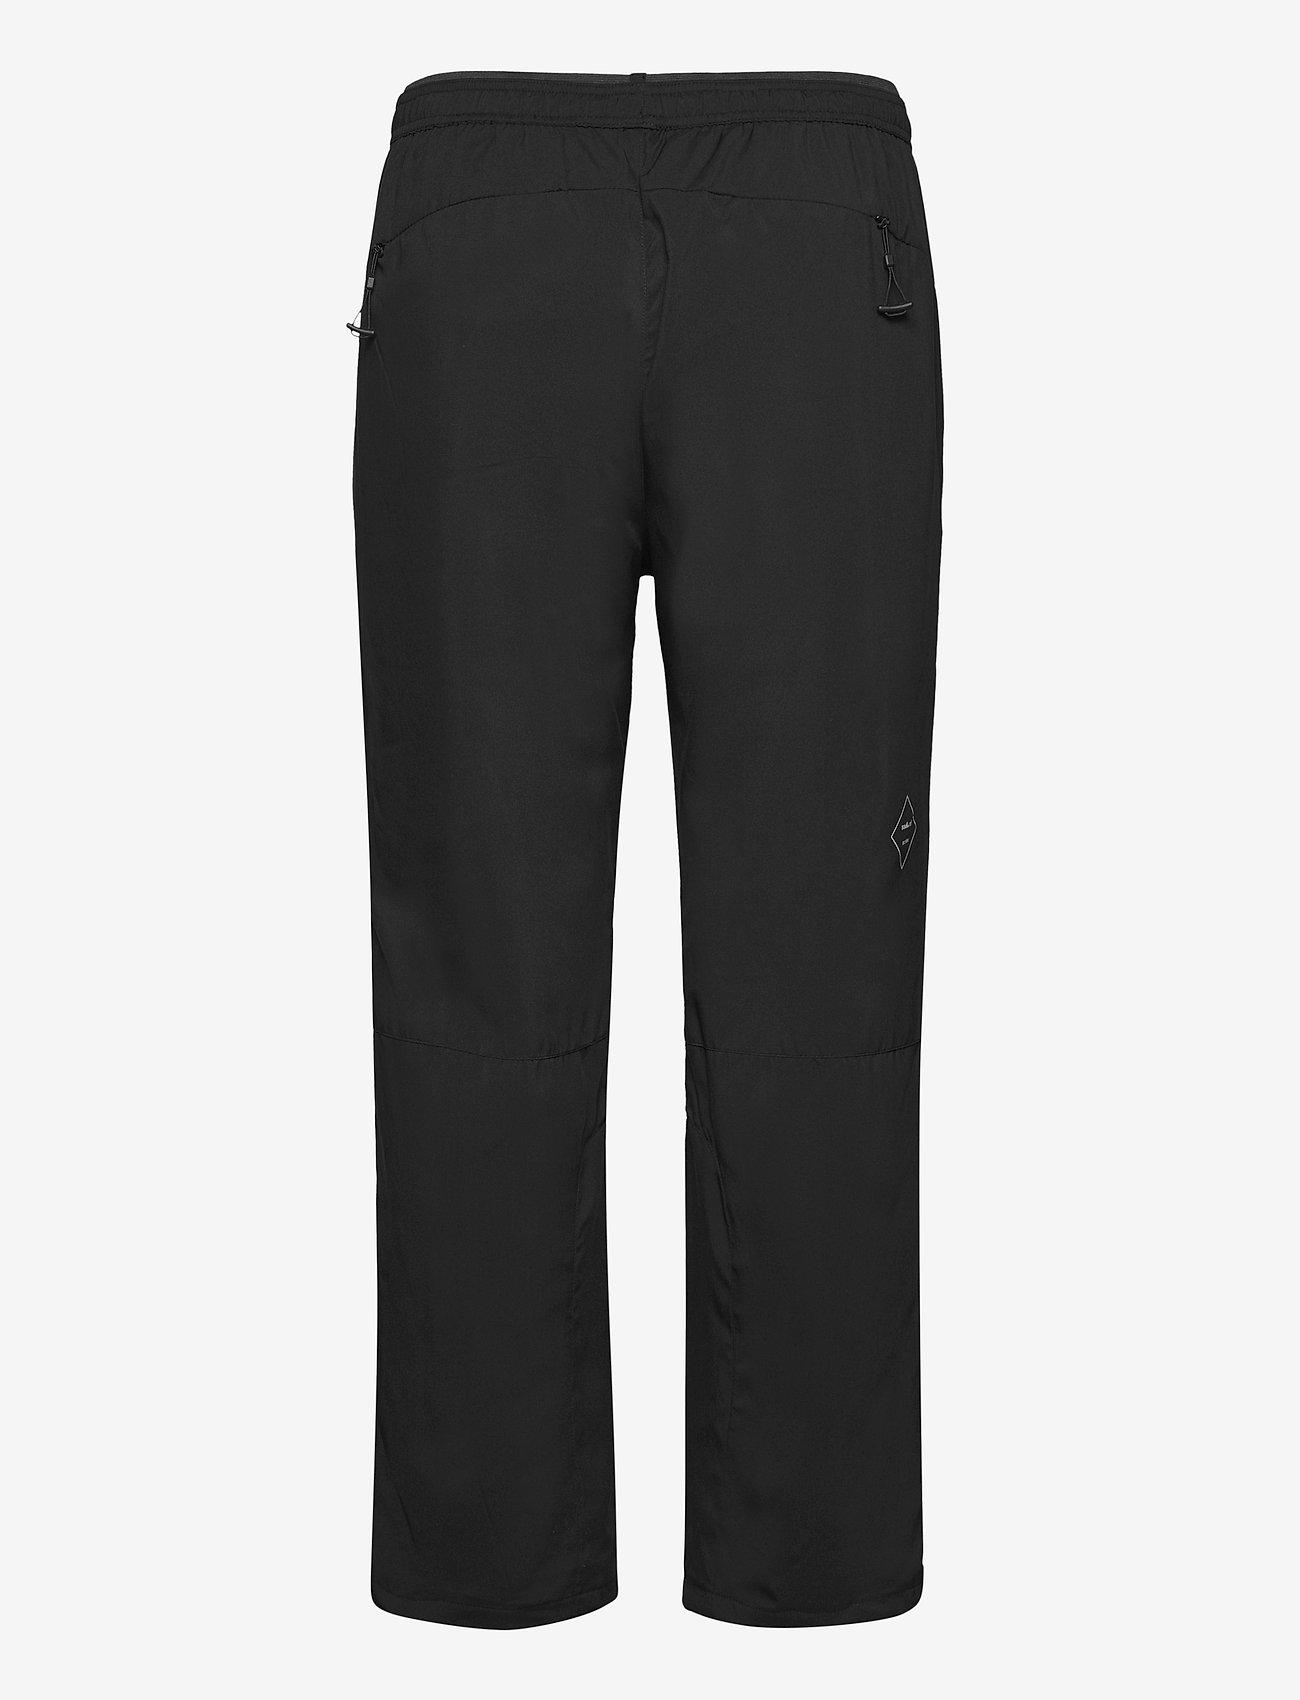 Soulland - Frey pants - spodnie na co dzień - black - 1